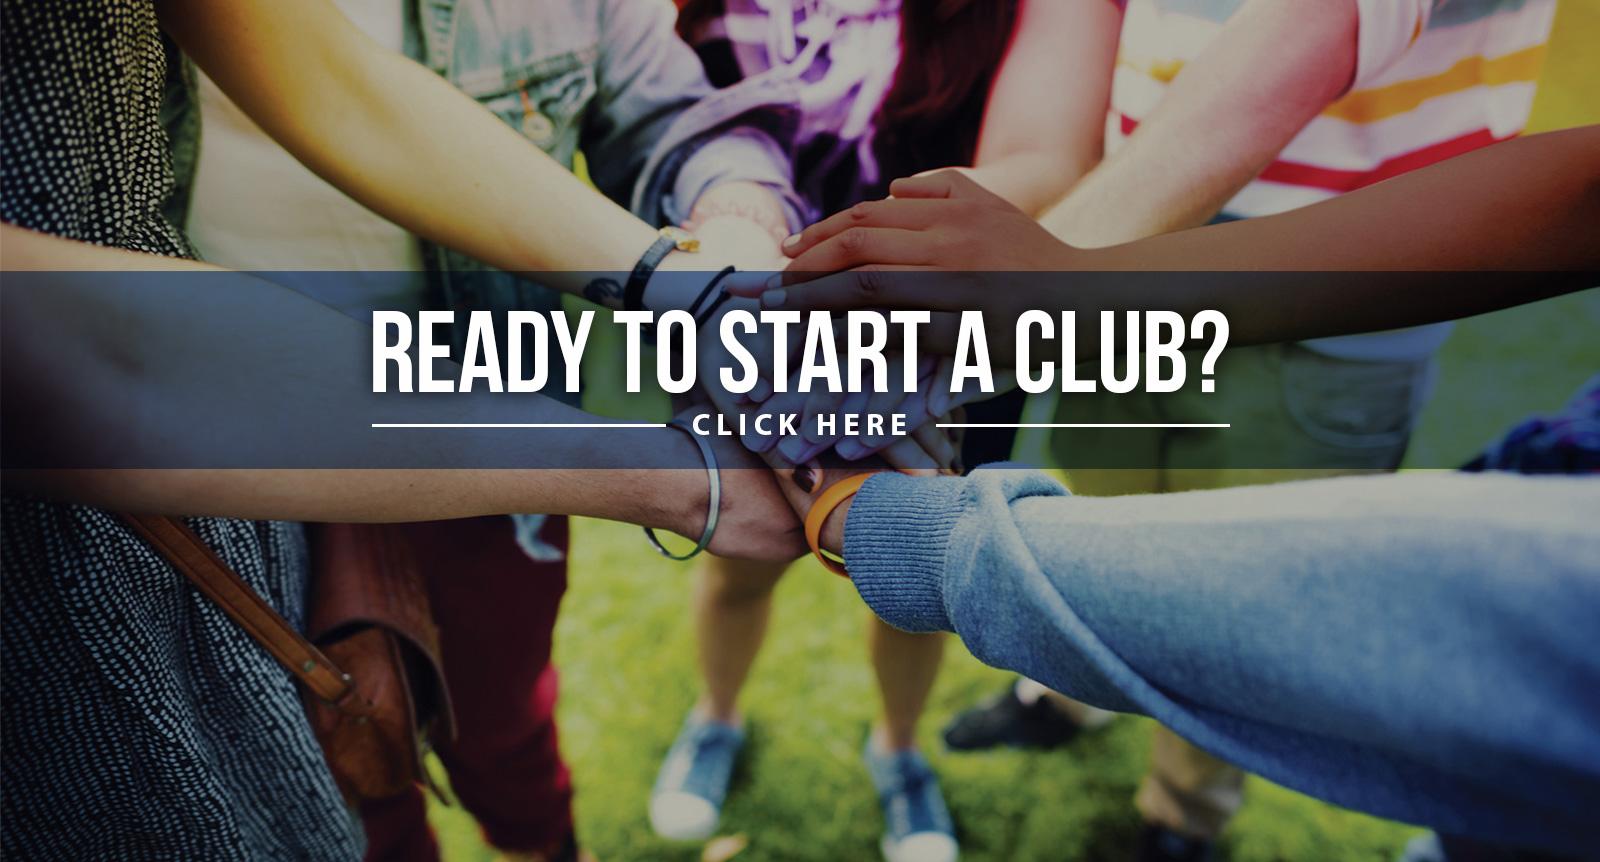 Start a club